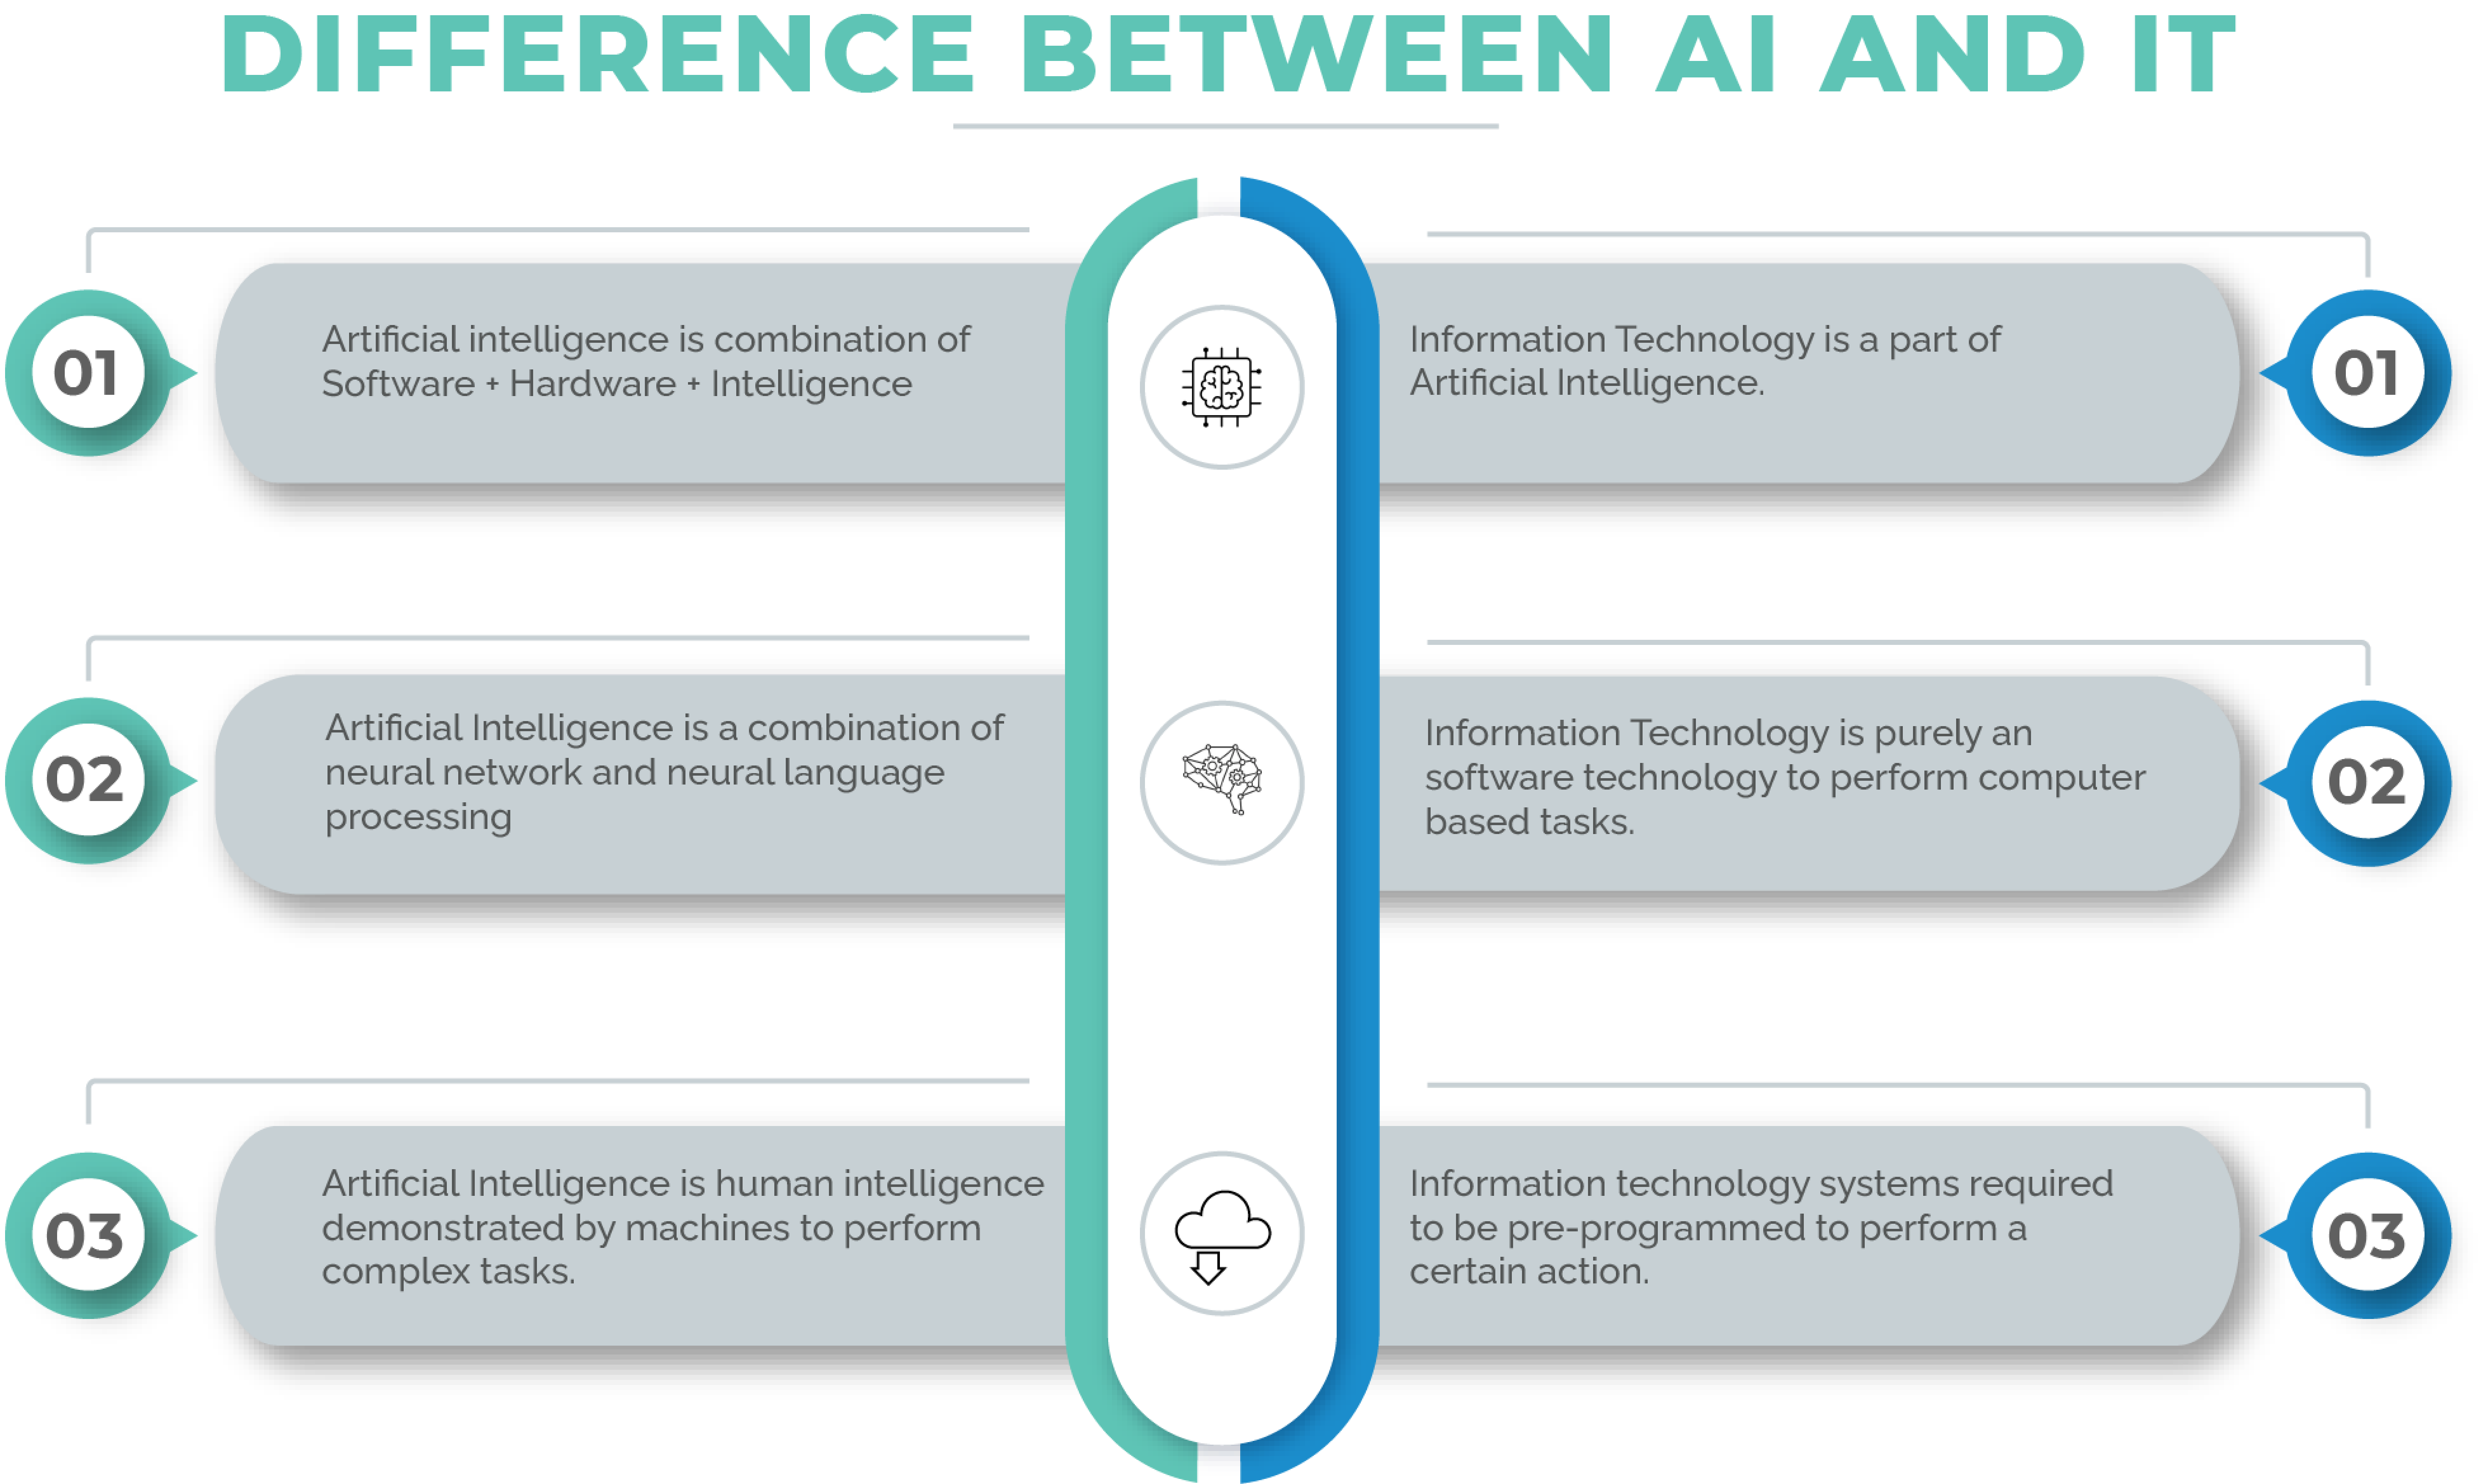 AI vs IT